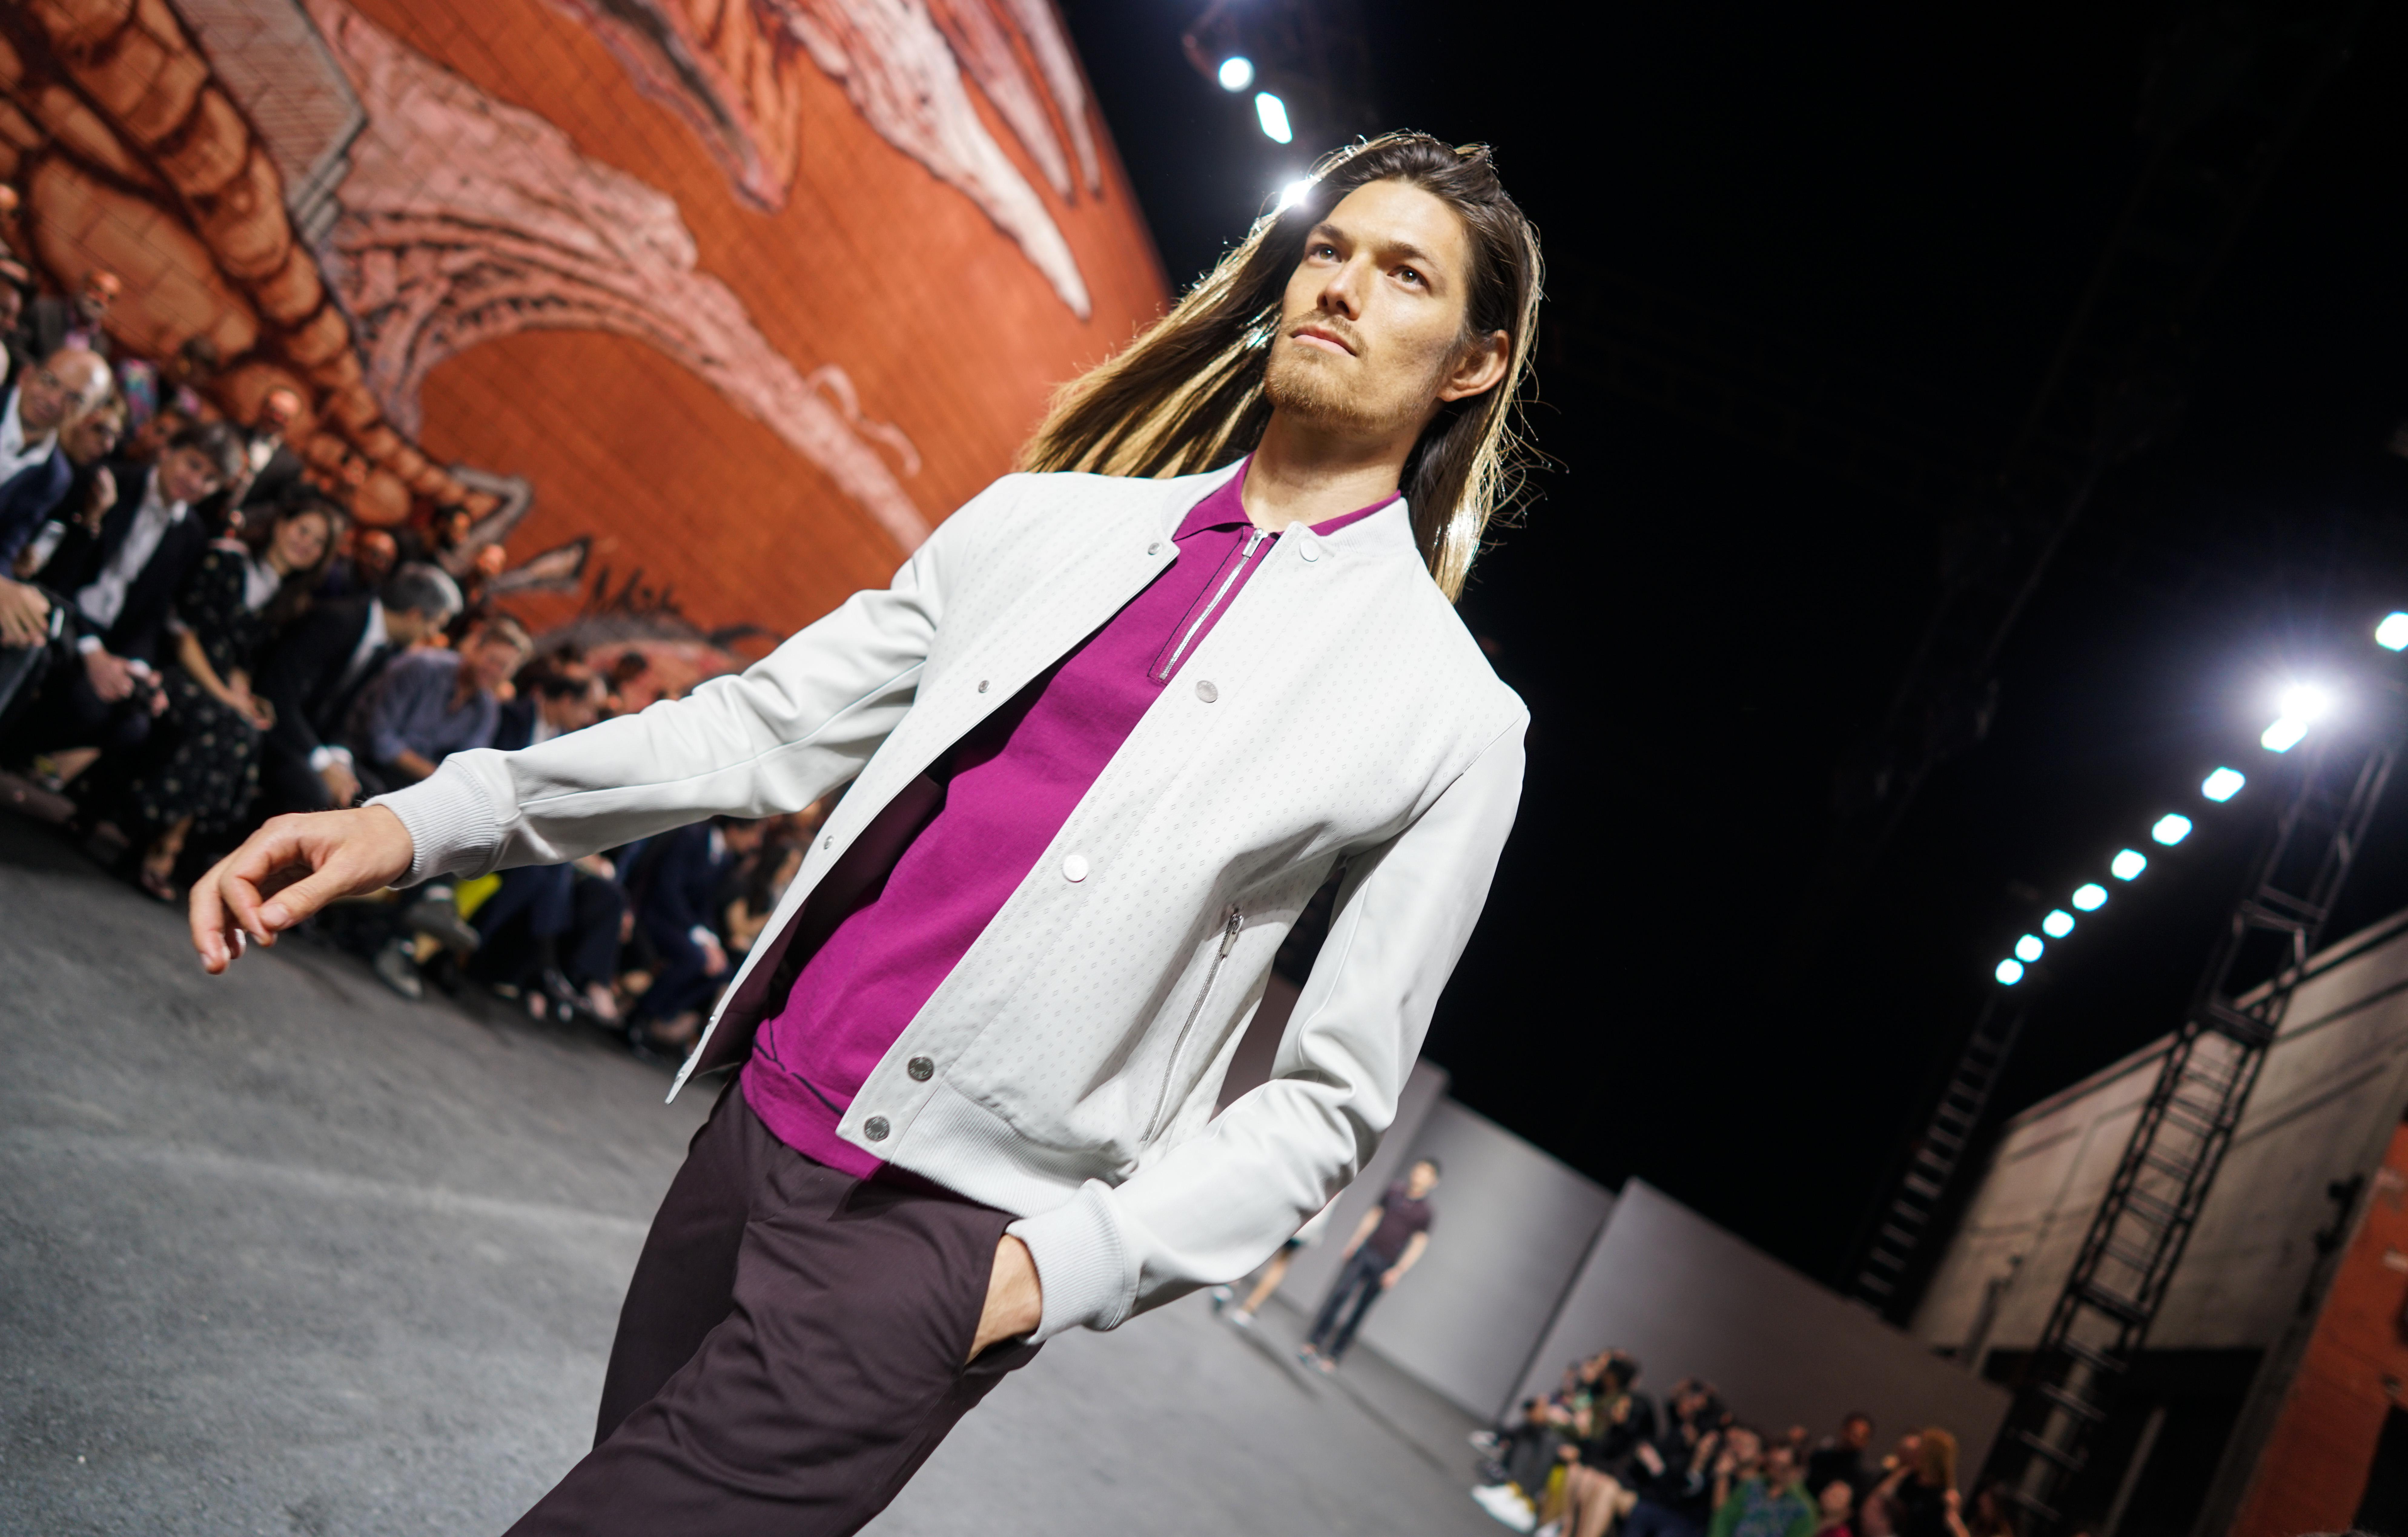 Model on the catwalkHermes DWNTWNMEN fashion show, Runway, Los Angeles, USA - 09 Mar 2017